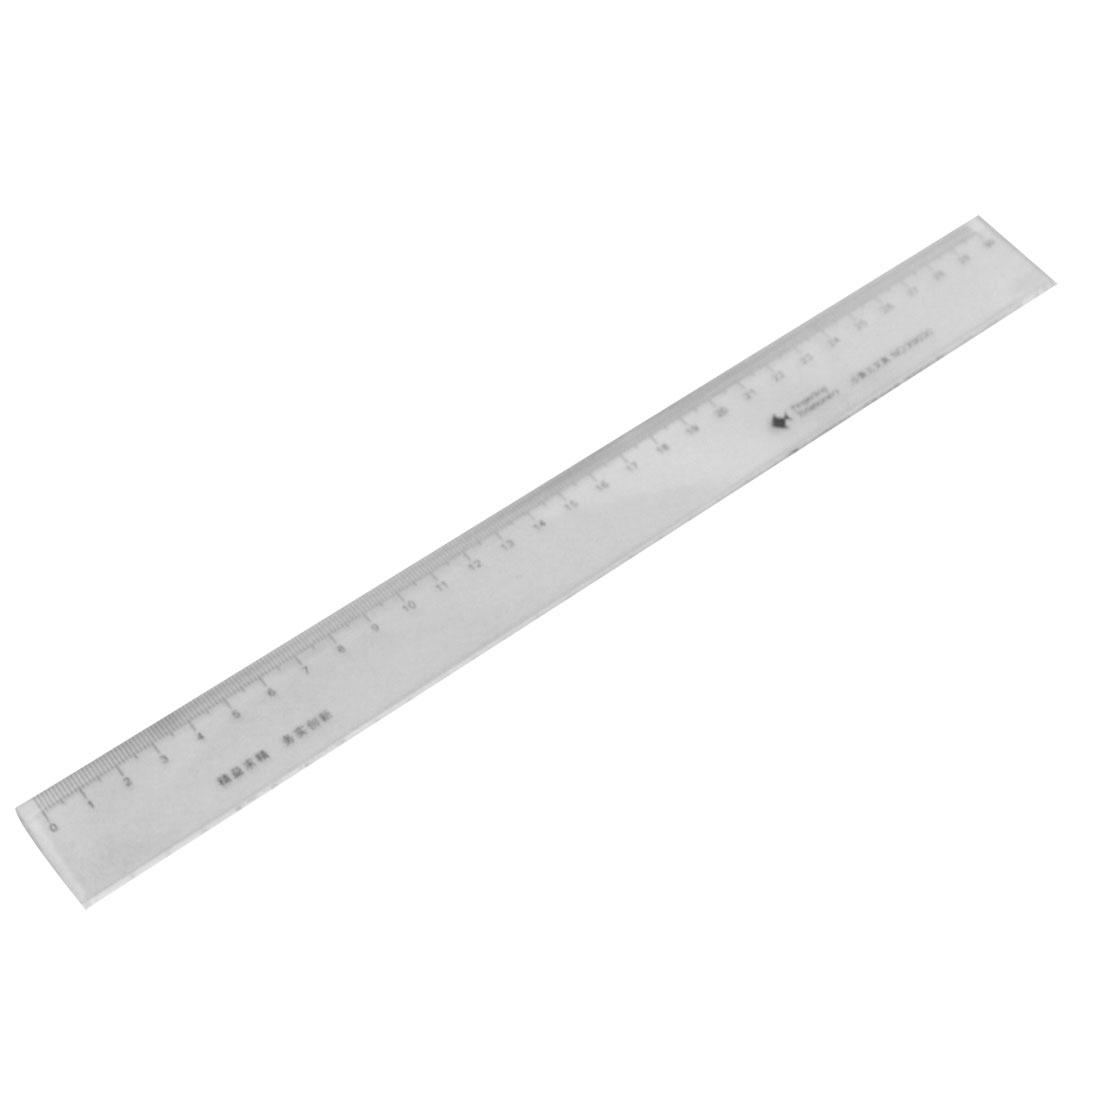 Students Metric 30cm Measurement Black Scale Plastic Straight Ruler 2 Pcs